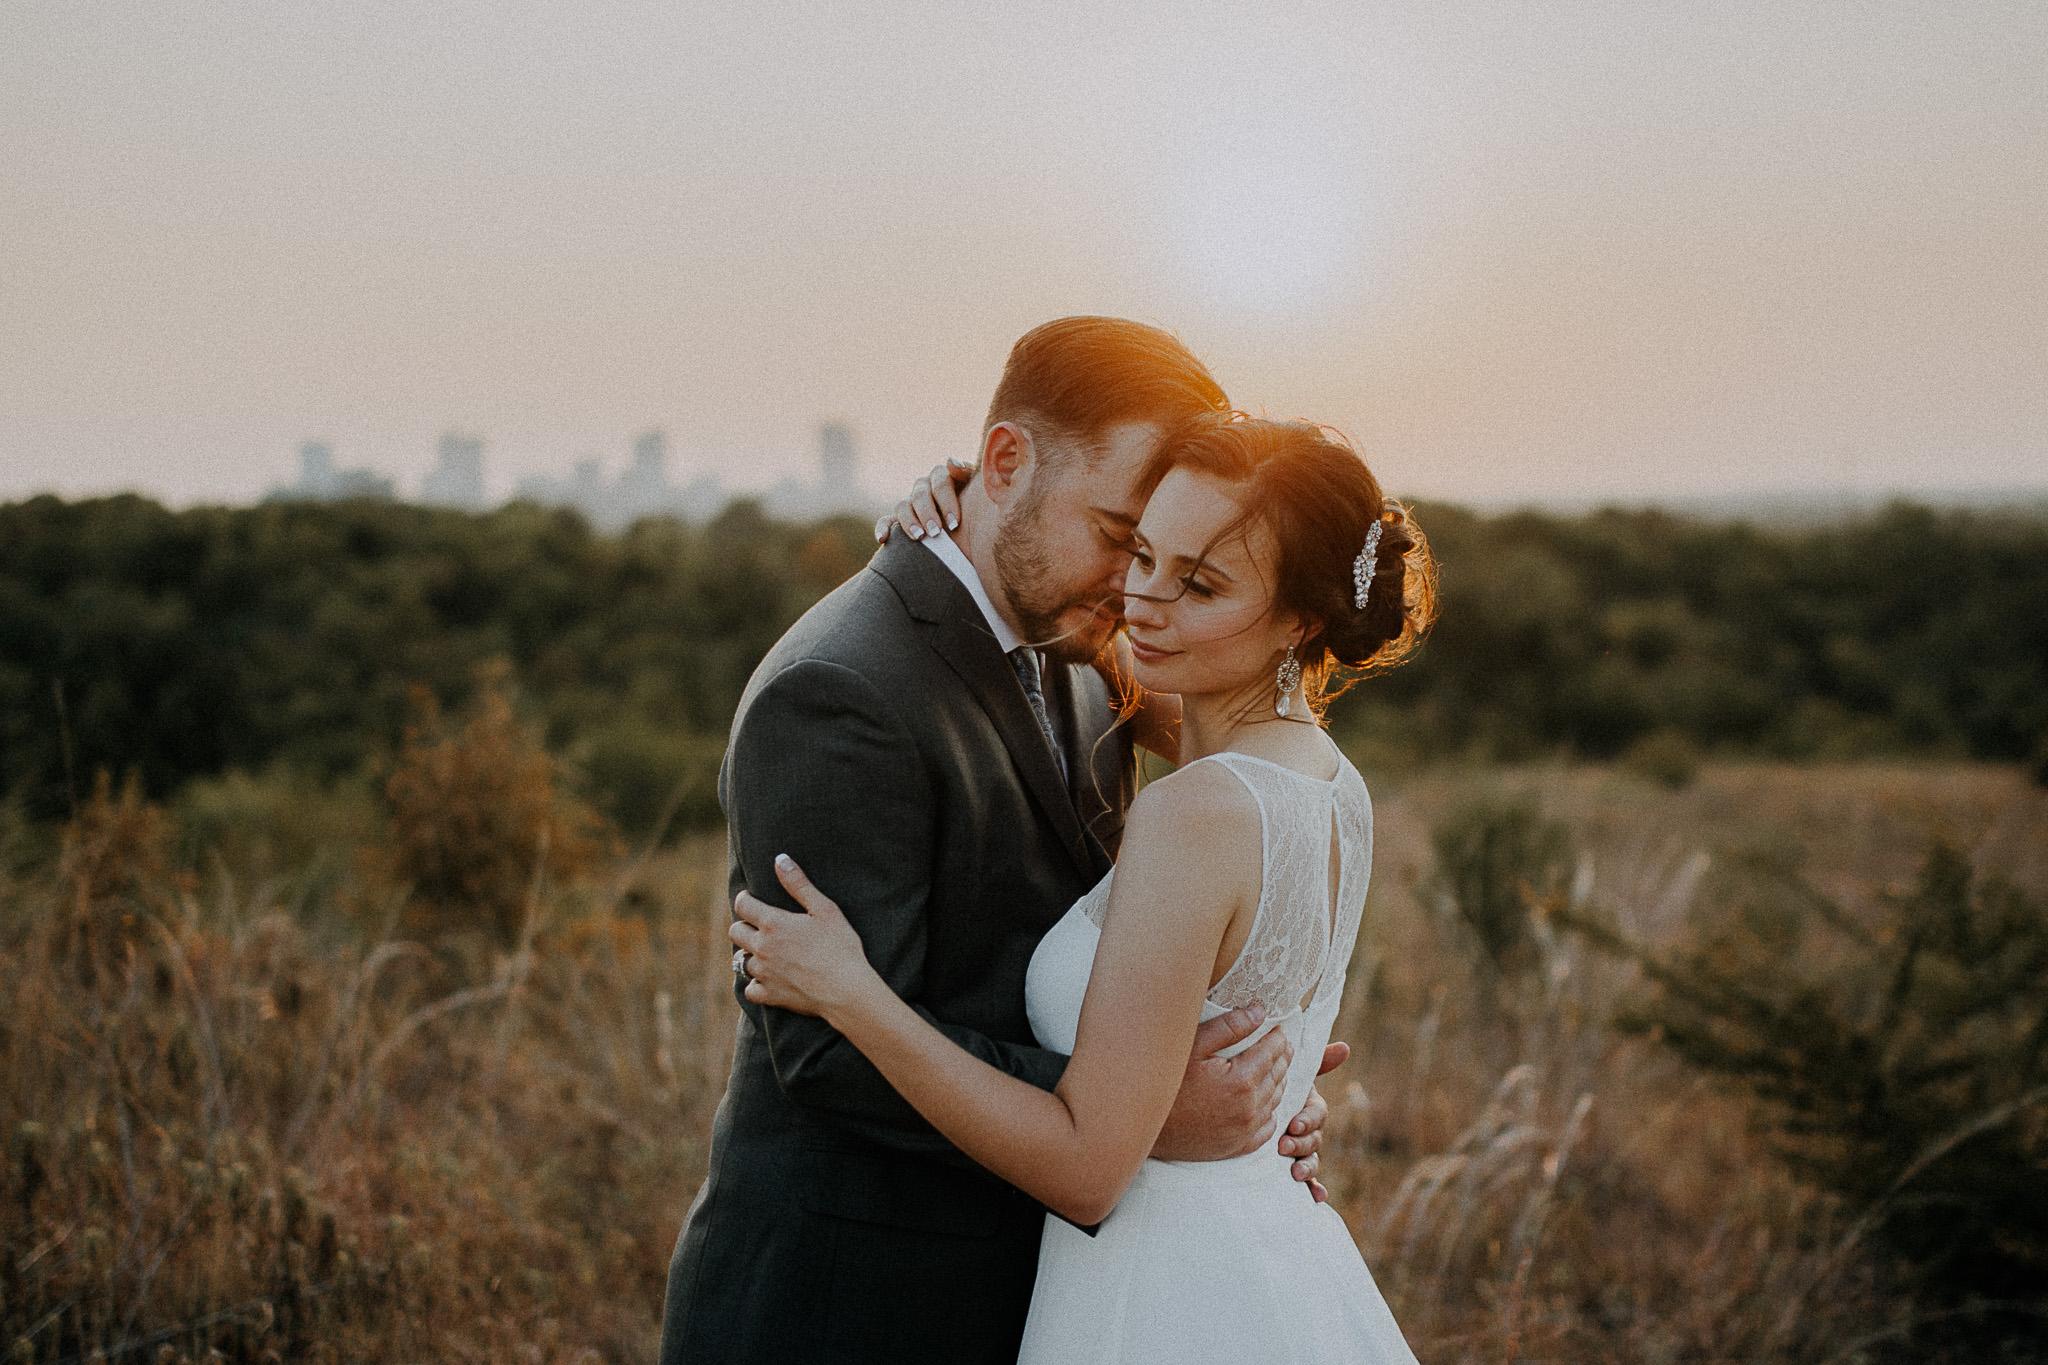 Jessi_marie_photography_dallas_texas_wedding__photographer-86.jpg